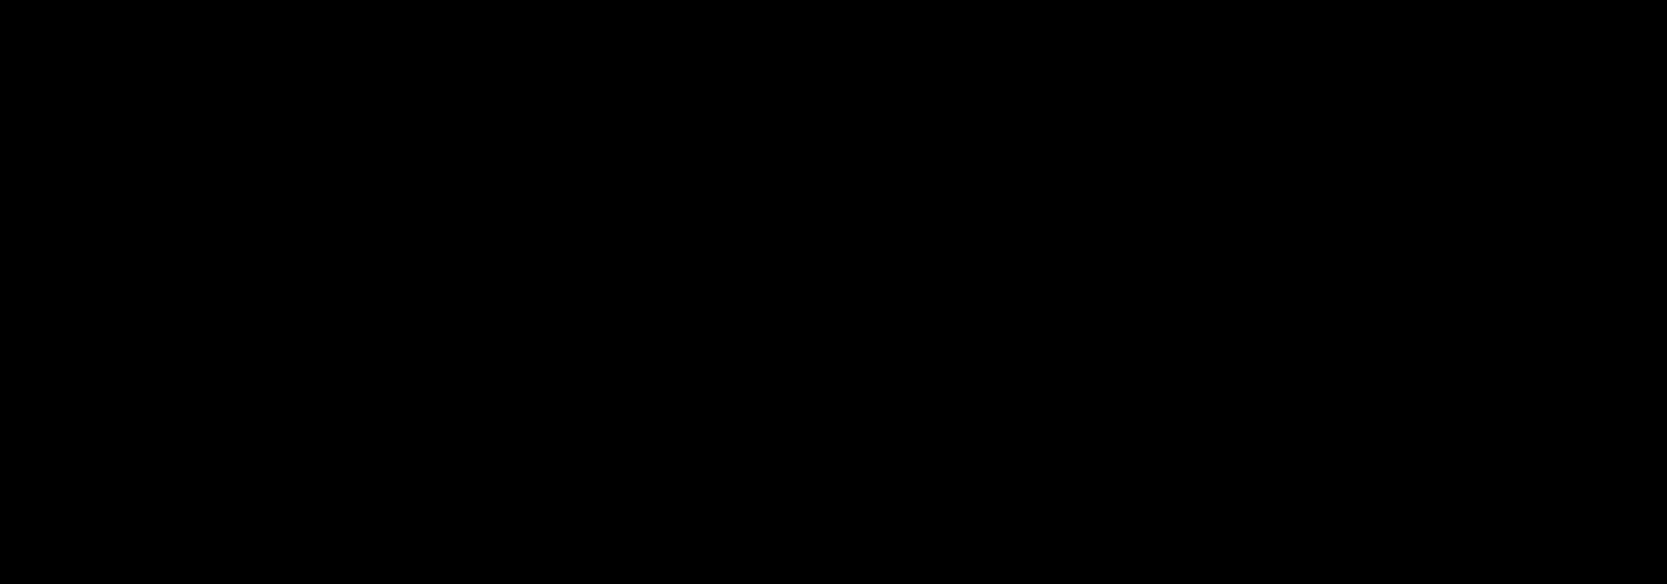 Unilever_Black-01